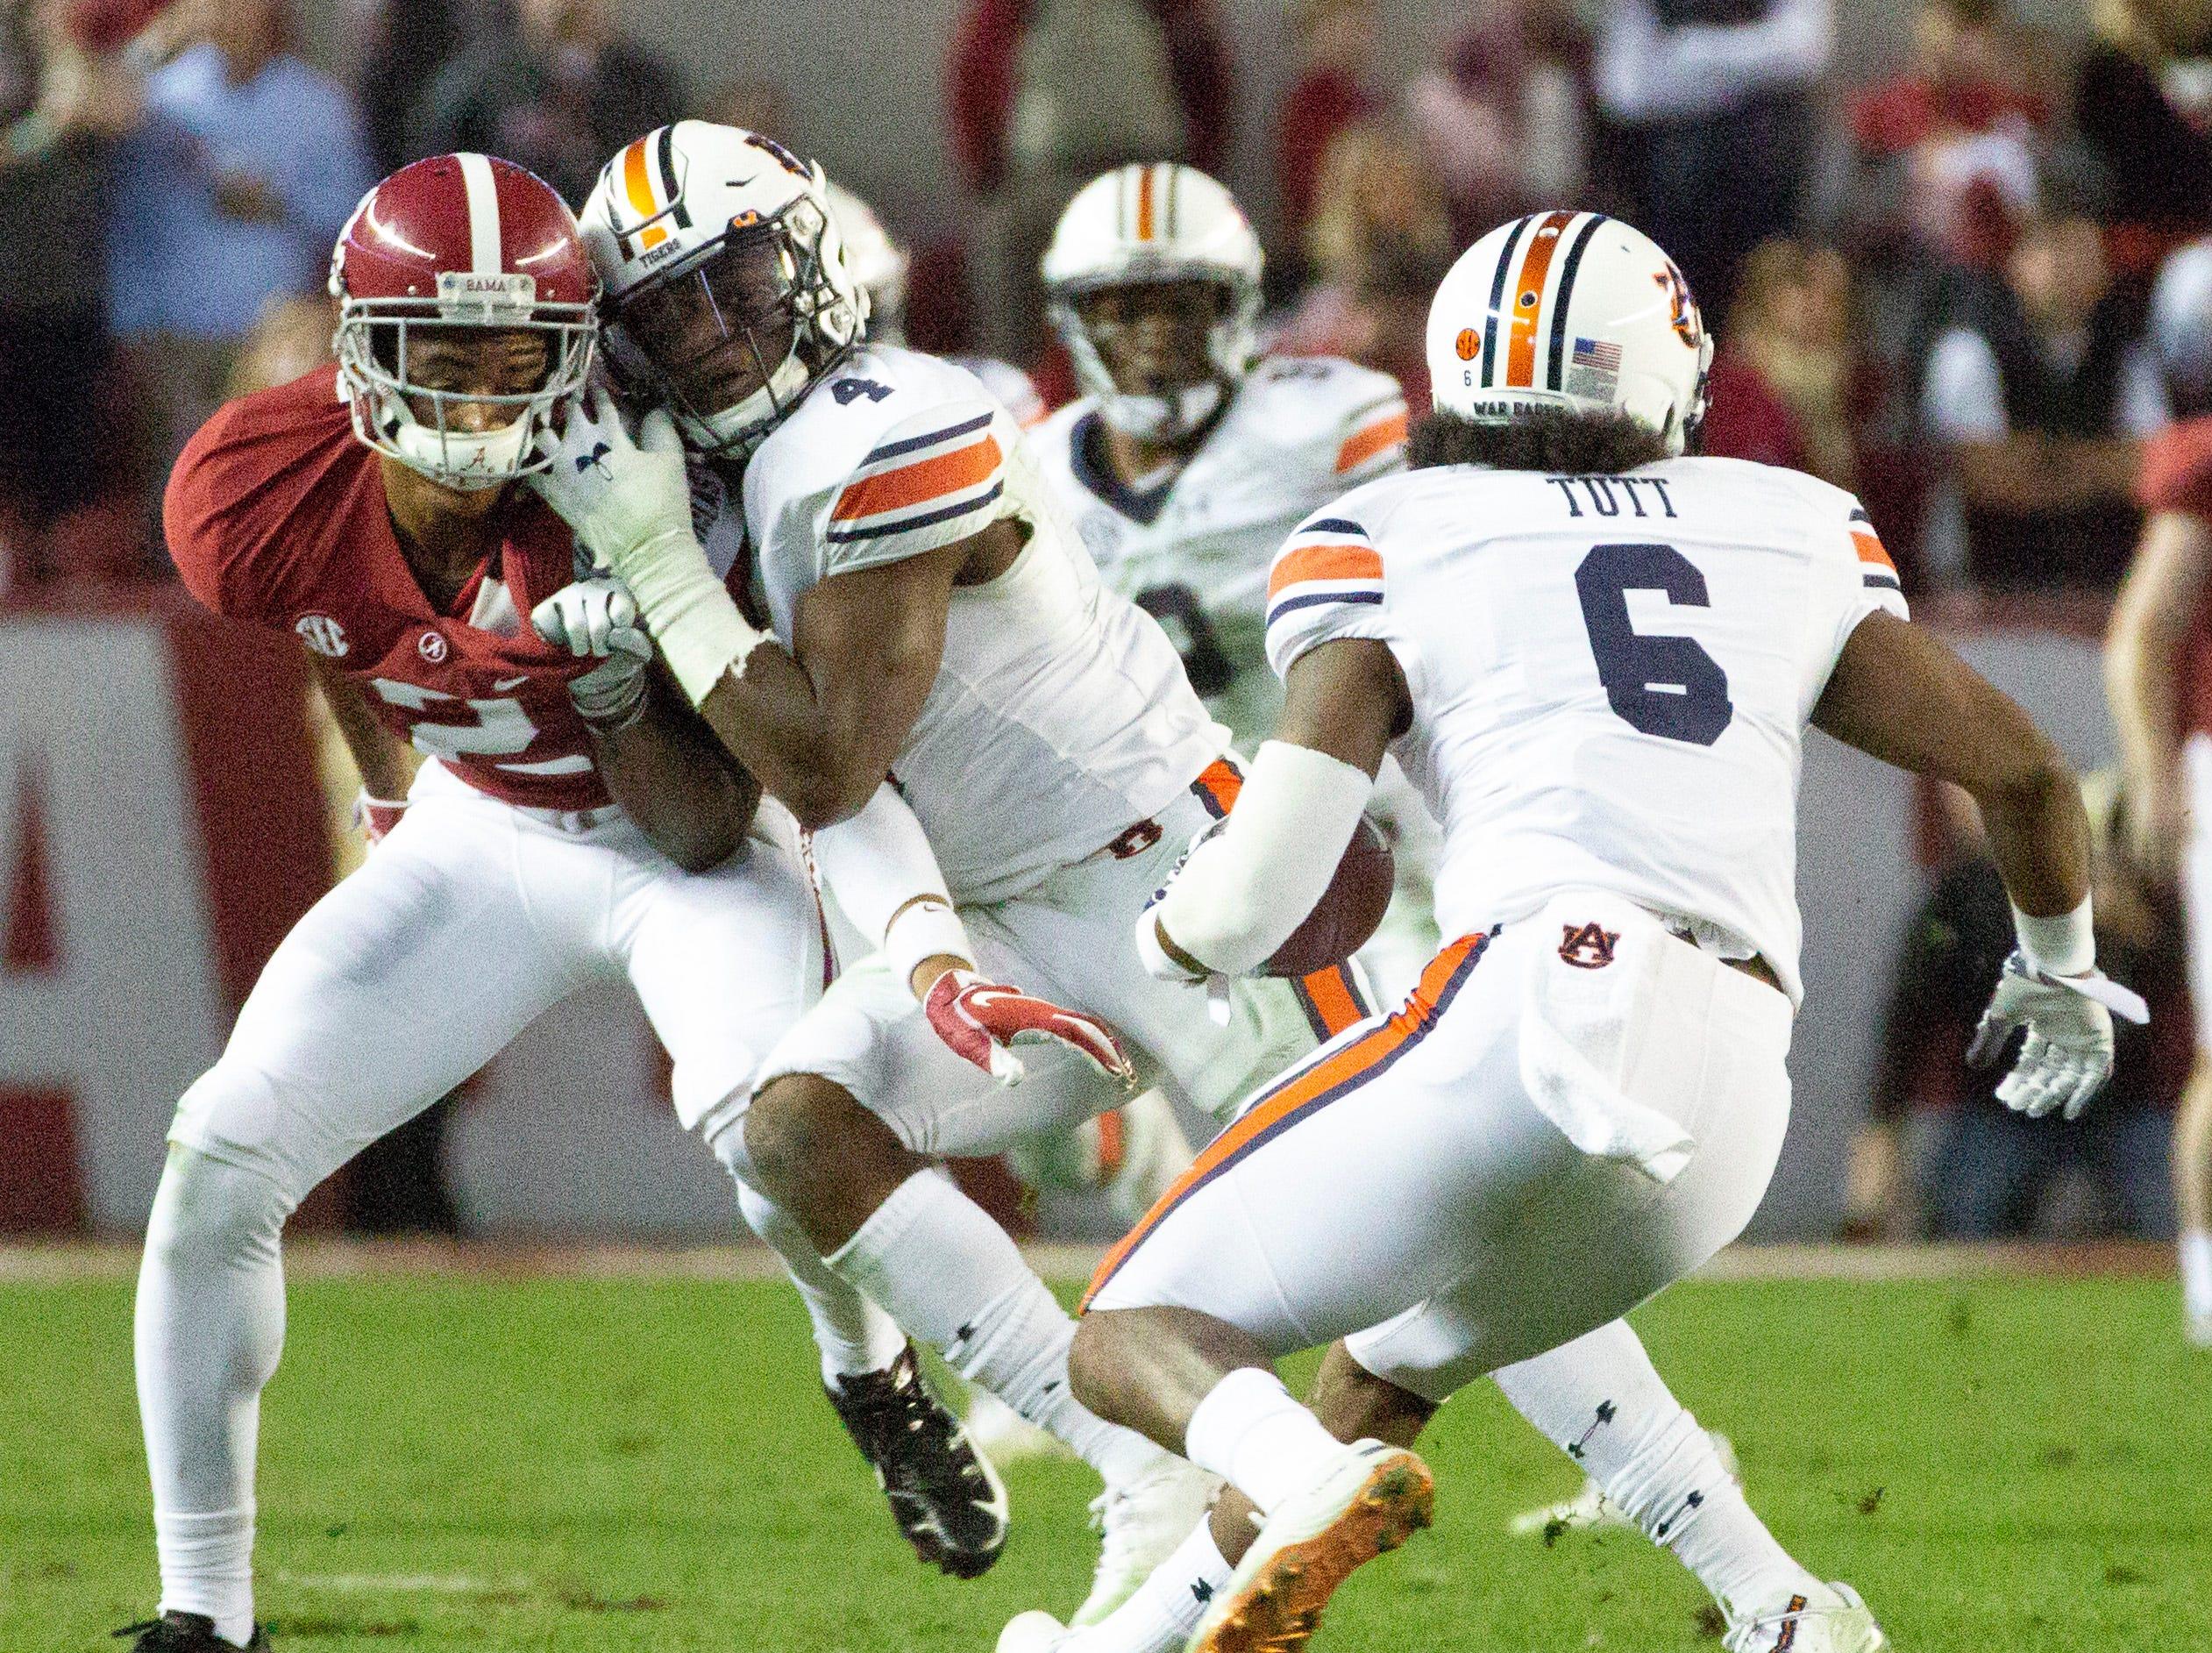 Auburn's Noah Igbinoghene gives Alabama's Patrick Surtain II a hug as the Tigers' Christian Tutt runs the ball.